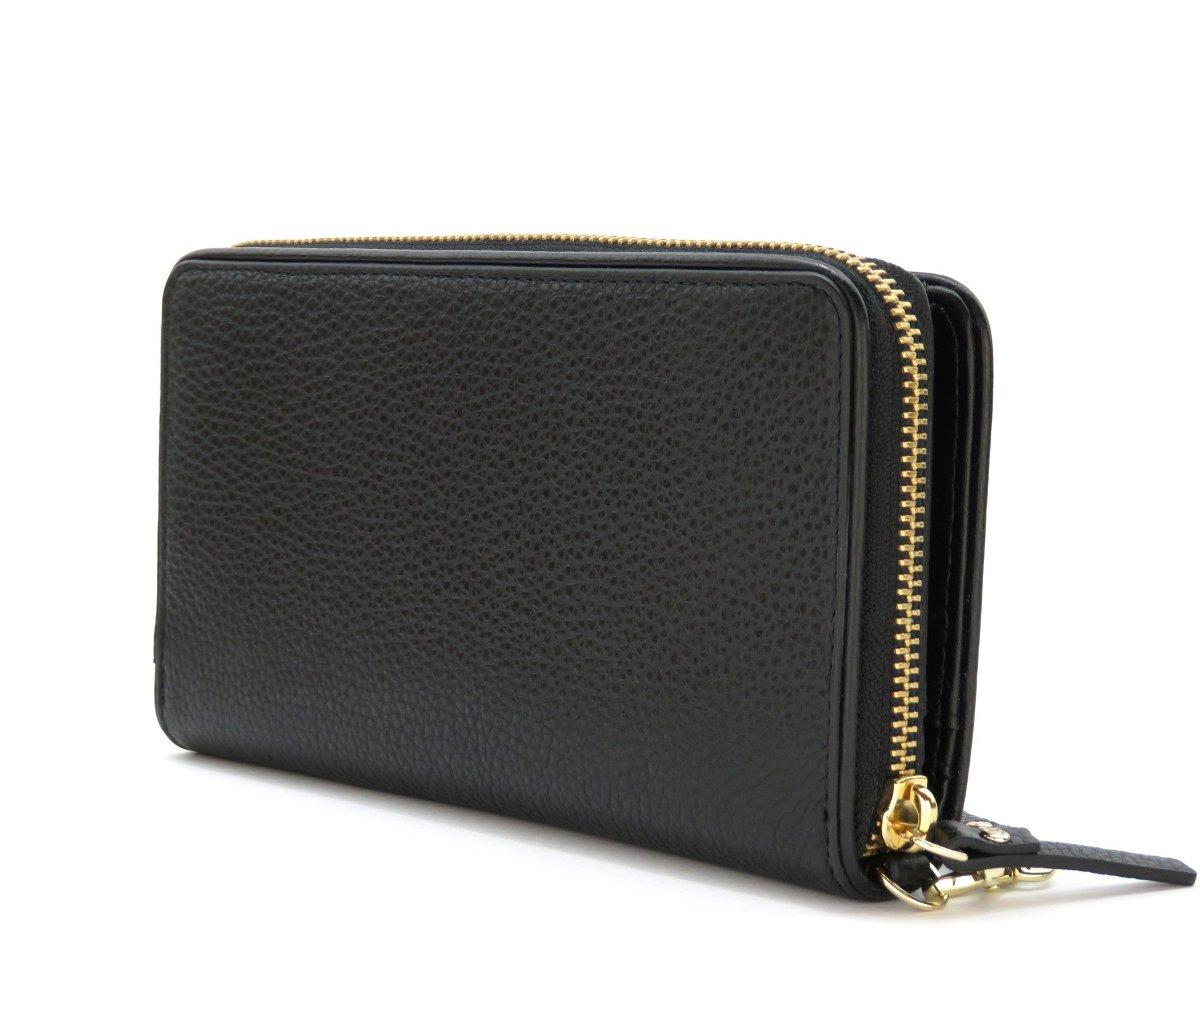 Kate Spade New York Mulberry Street Brigitta Wristlet Wallet Handbag (Black) by Kate Spade New York (Image #2)